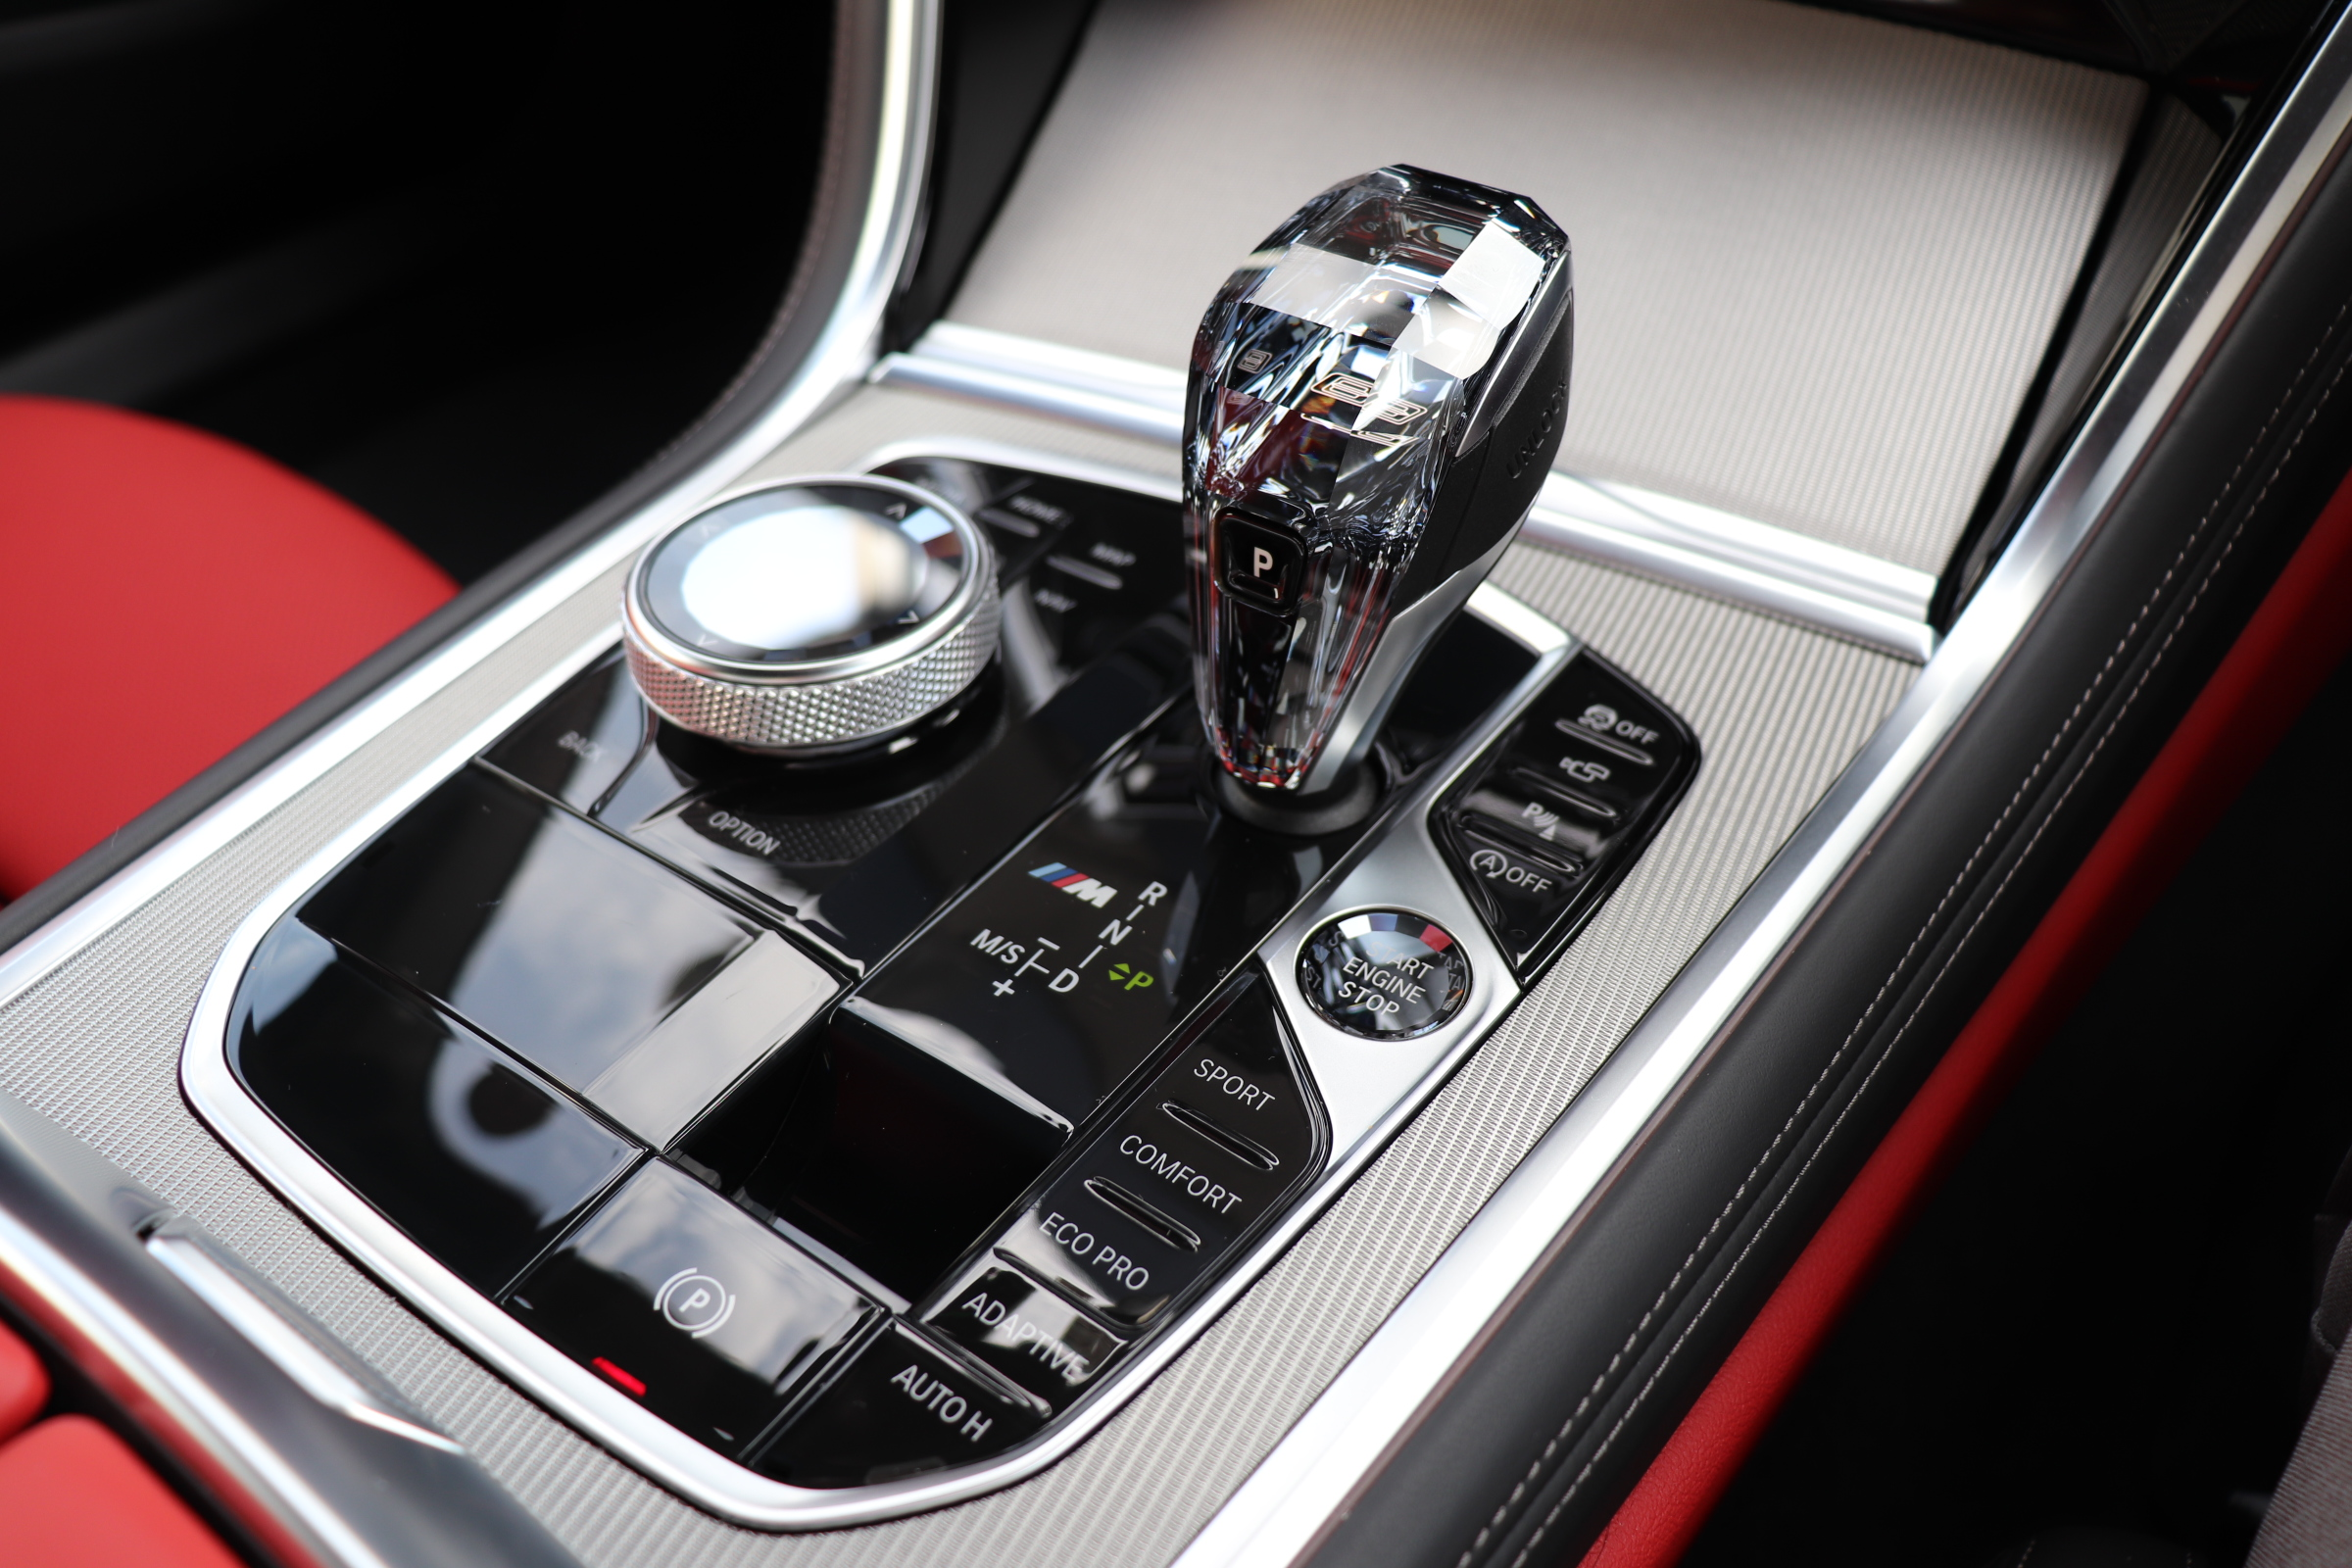 M850i xDrive クーペ カーボンルーフ バイカラーインテリア レーザーライト車両画像15